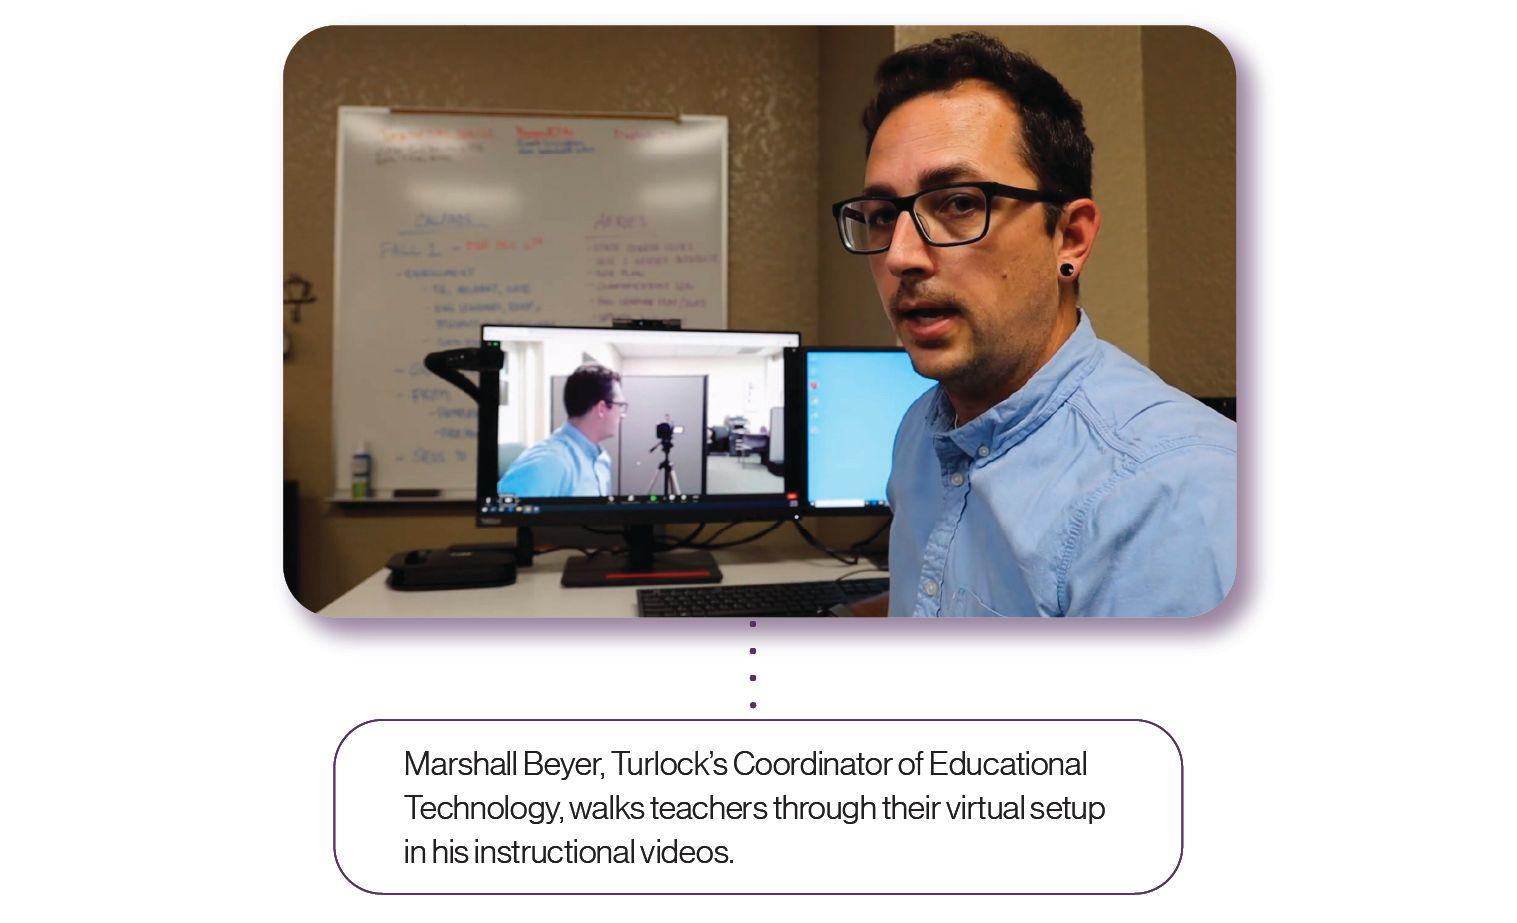 Image: Marshall Beyer, Turlock's Coordinator of Educational Technology, walks through their virtual setup in his instructional videos.